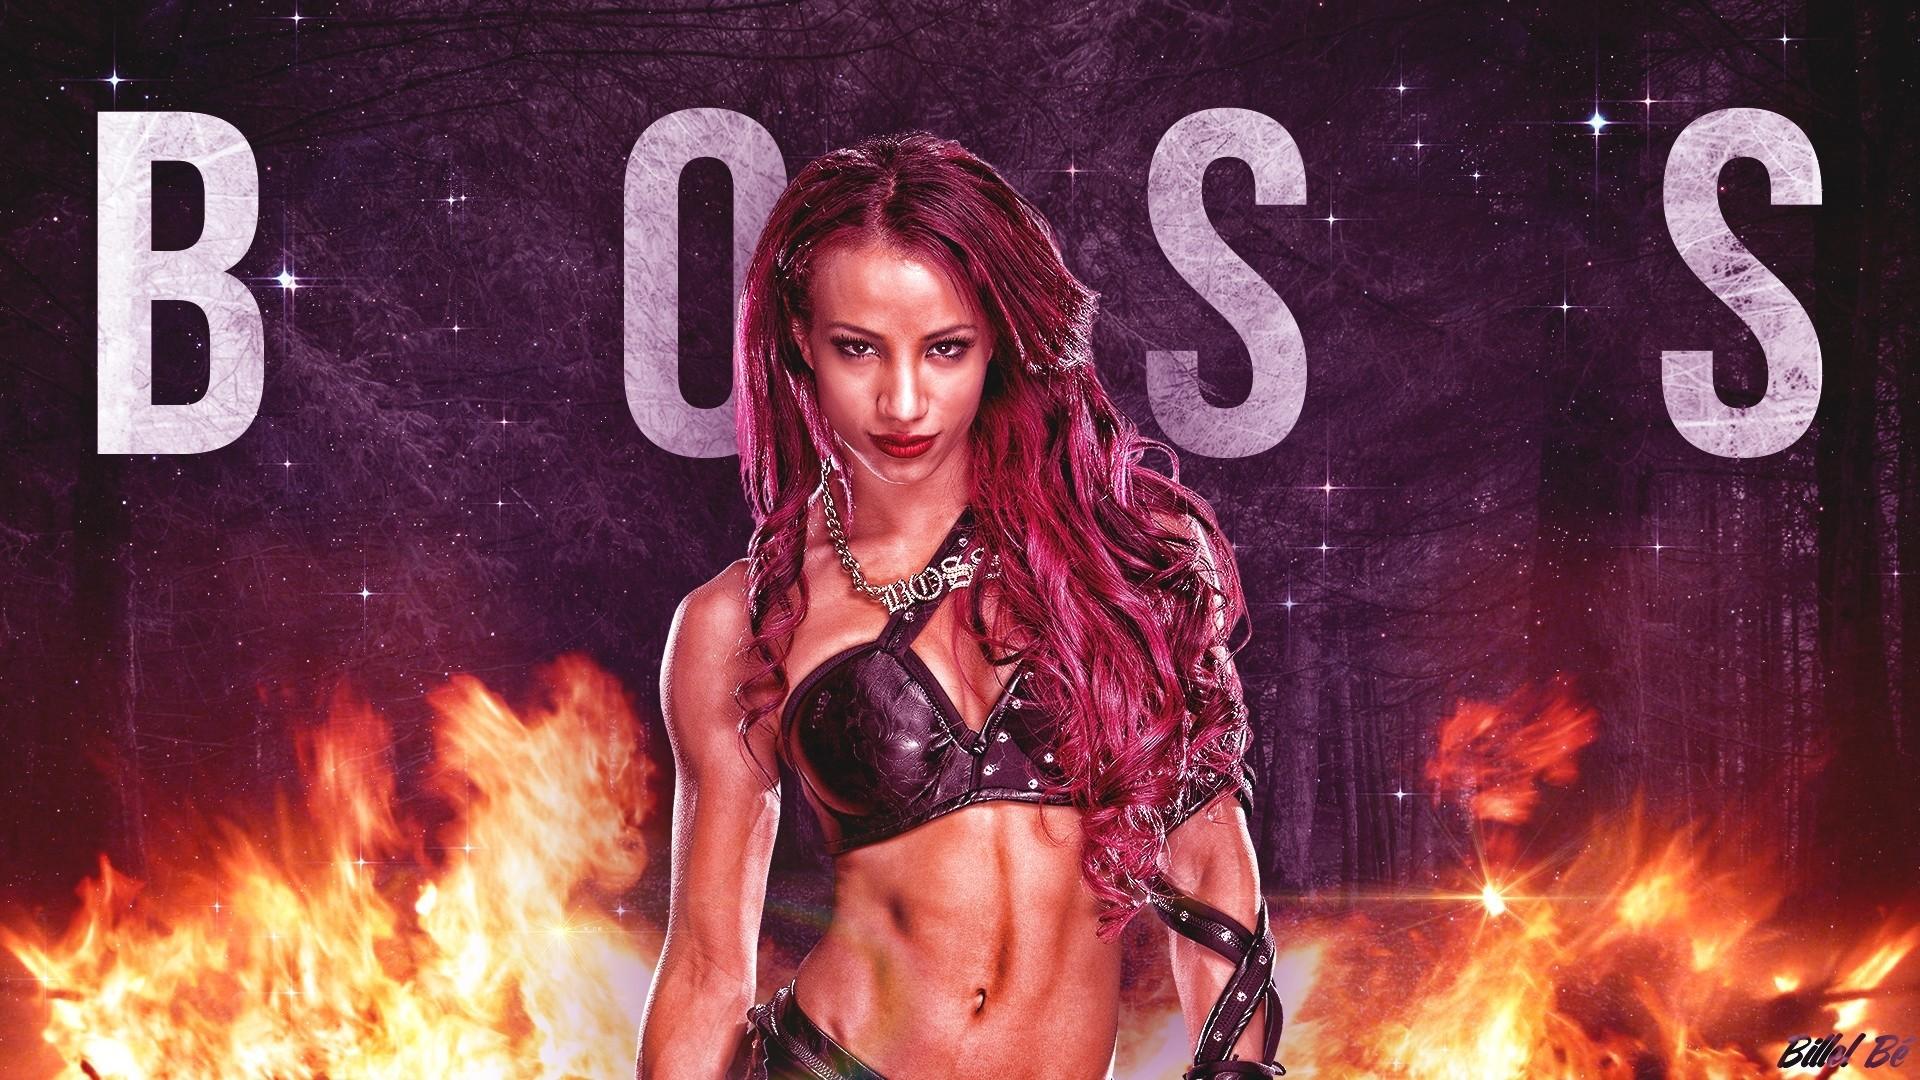 Sasha Banks hd wallpaper download